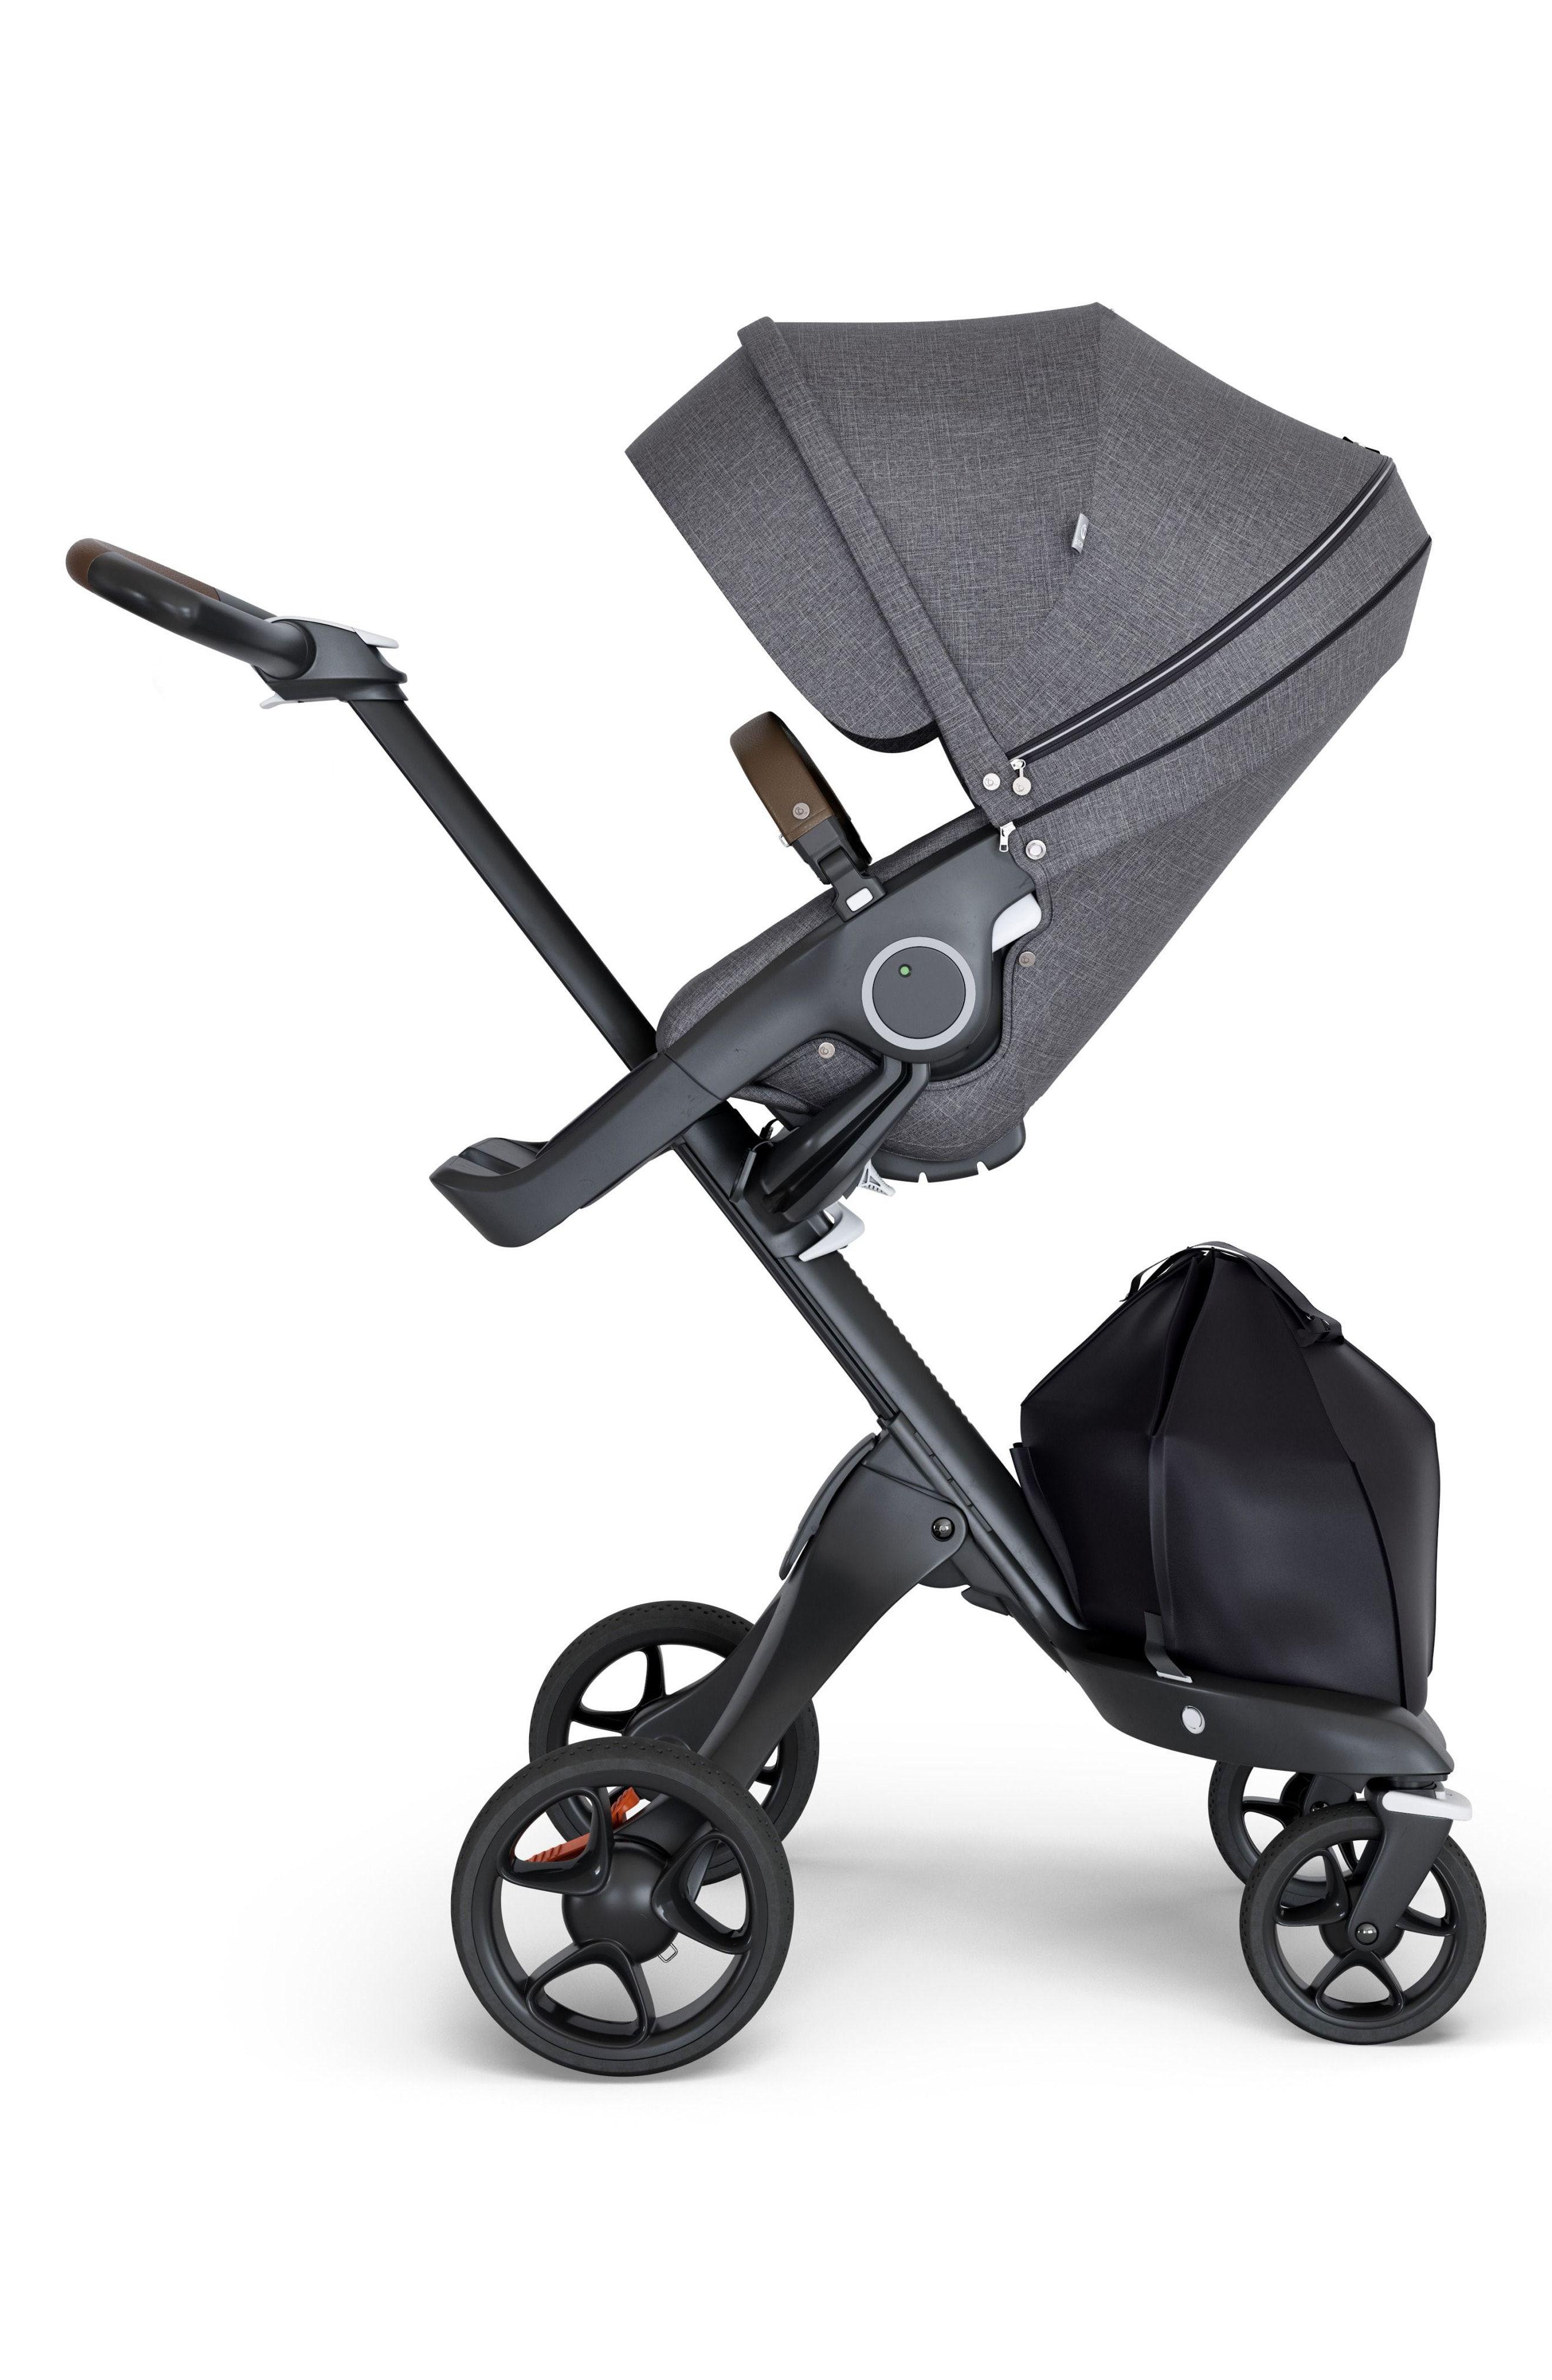 BABYZEN YOYO+ Pushchair, White/Peppermint Urban stroller